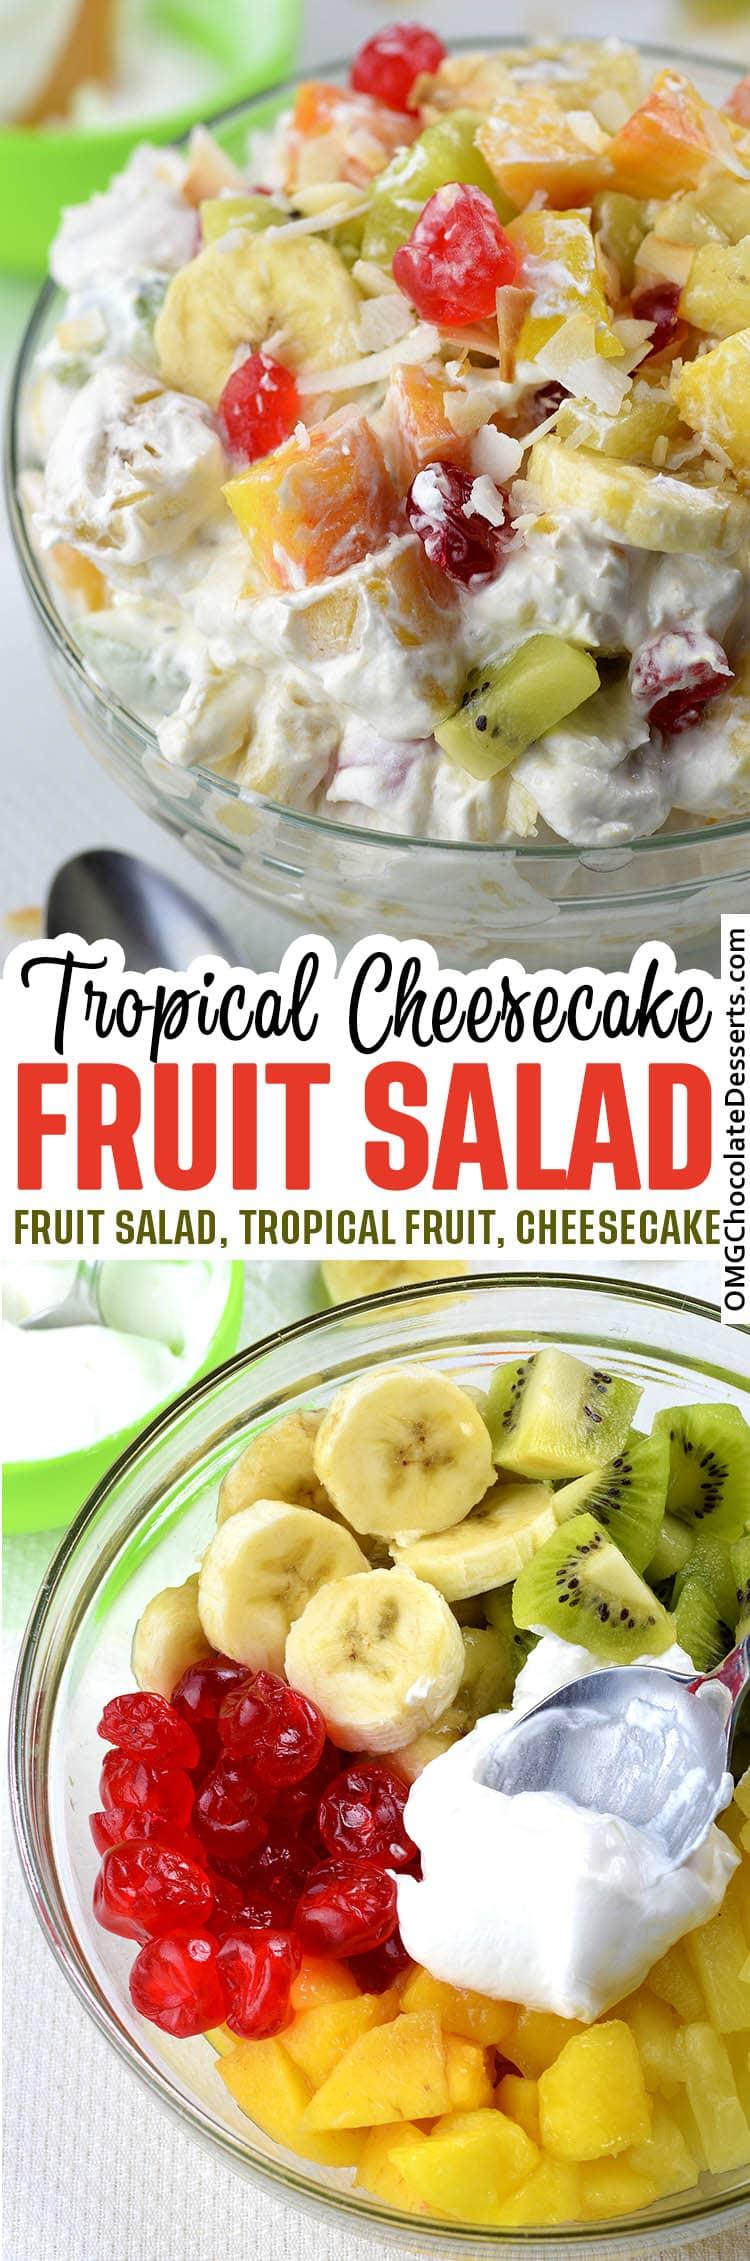 Tropical Cheesecake Salad